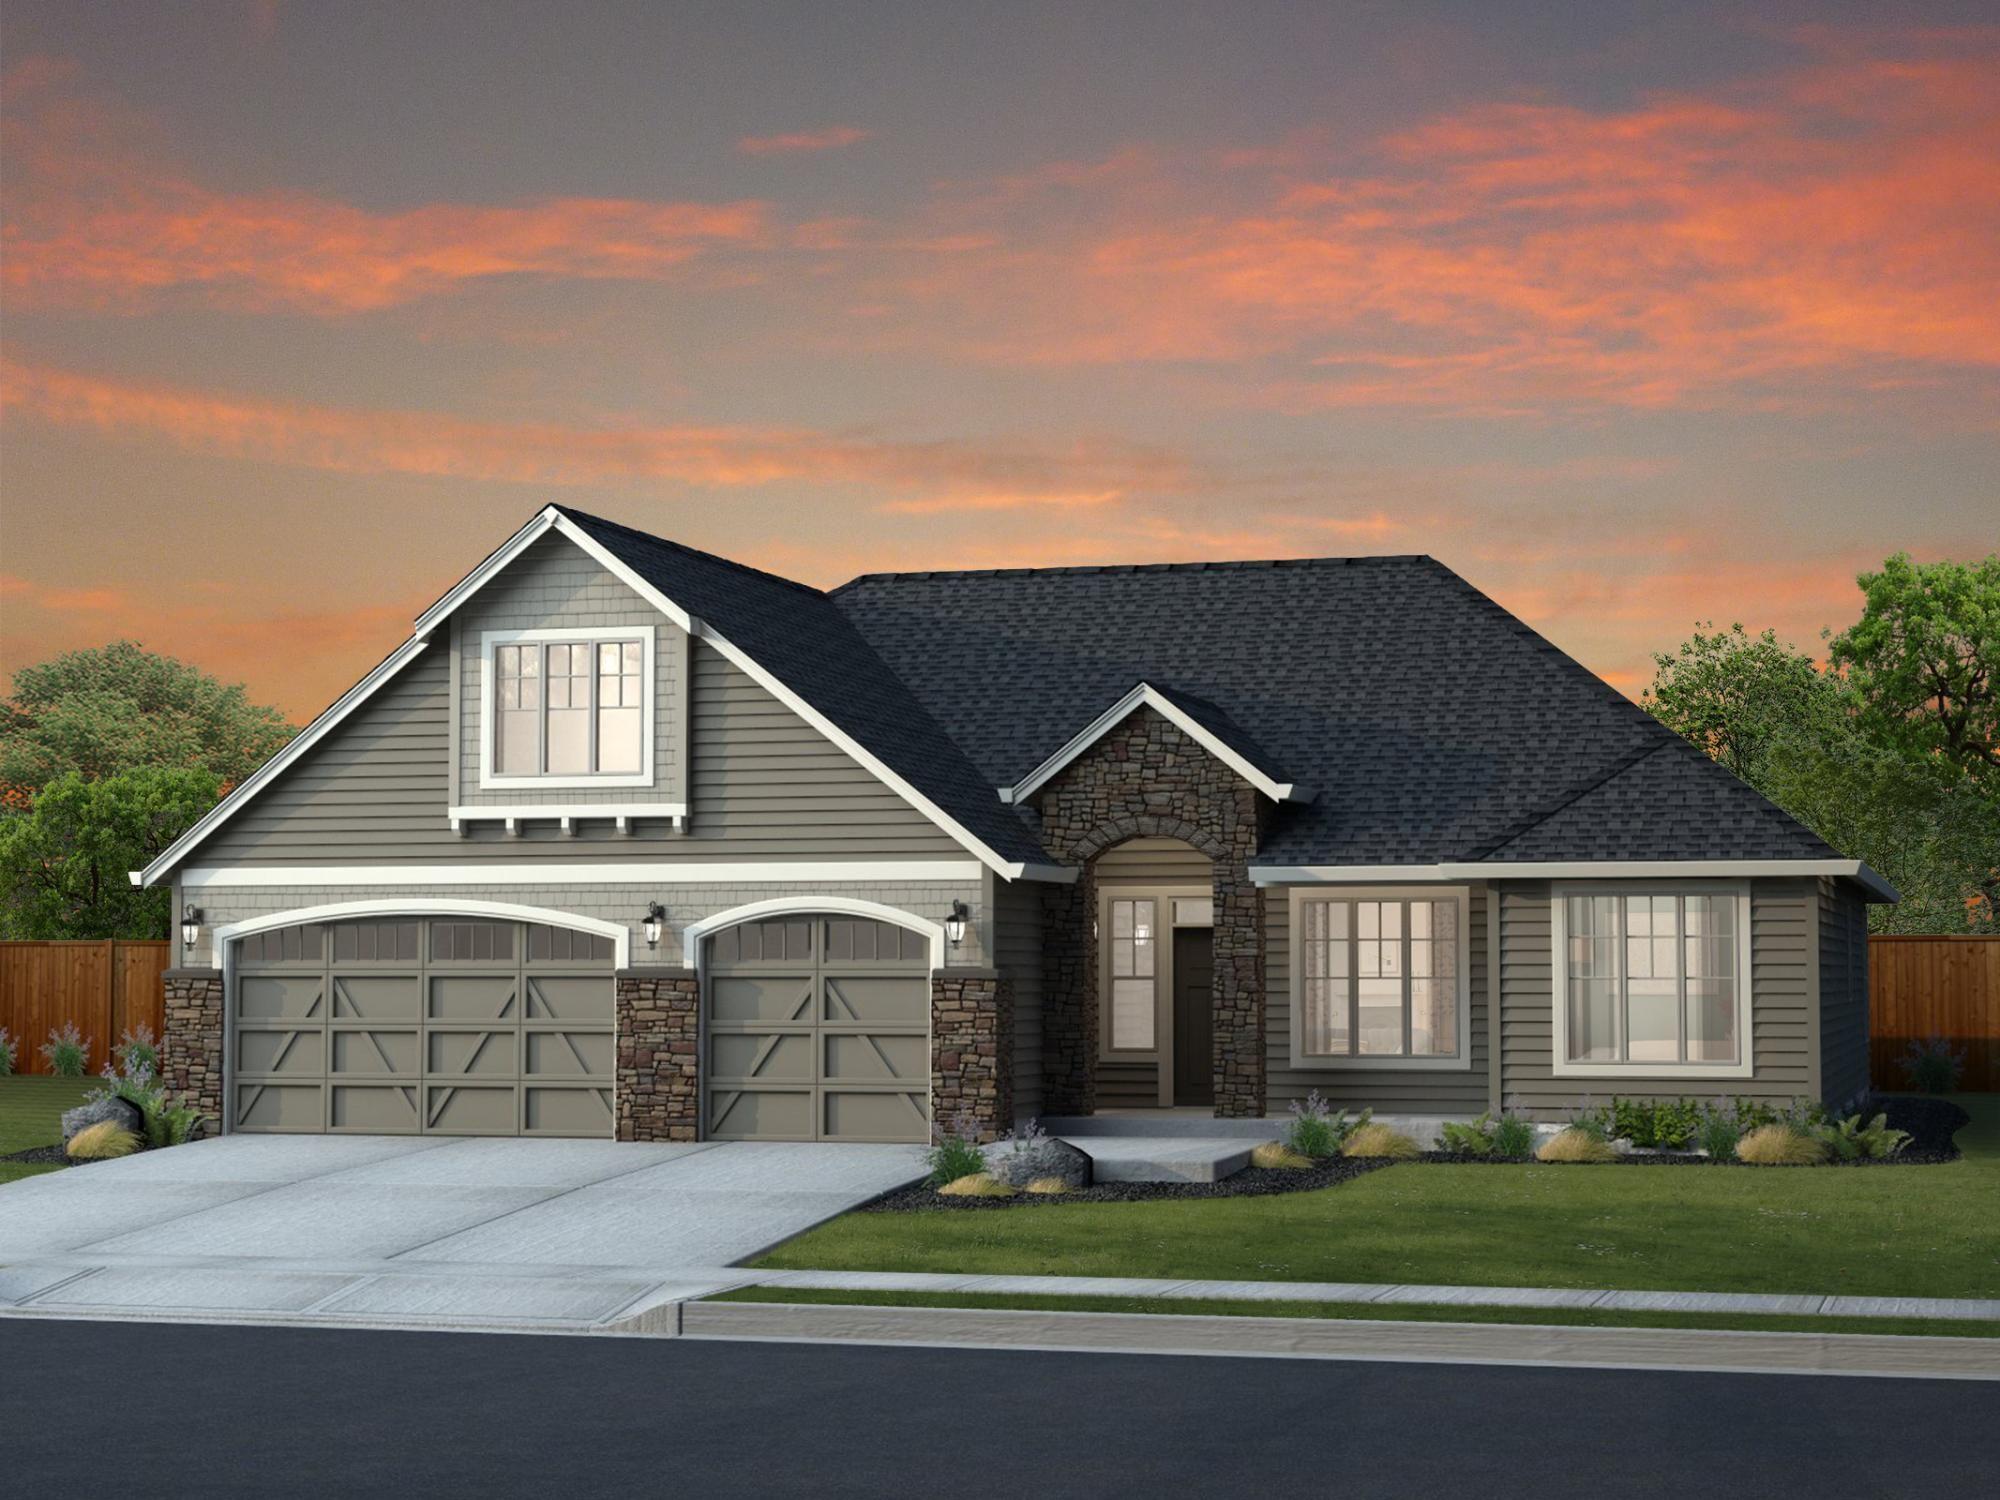 Prescott Nw Ps Craftsman House Plans Lake House Plans Dream House Plans